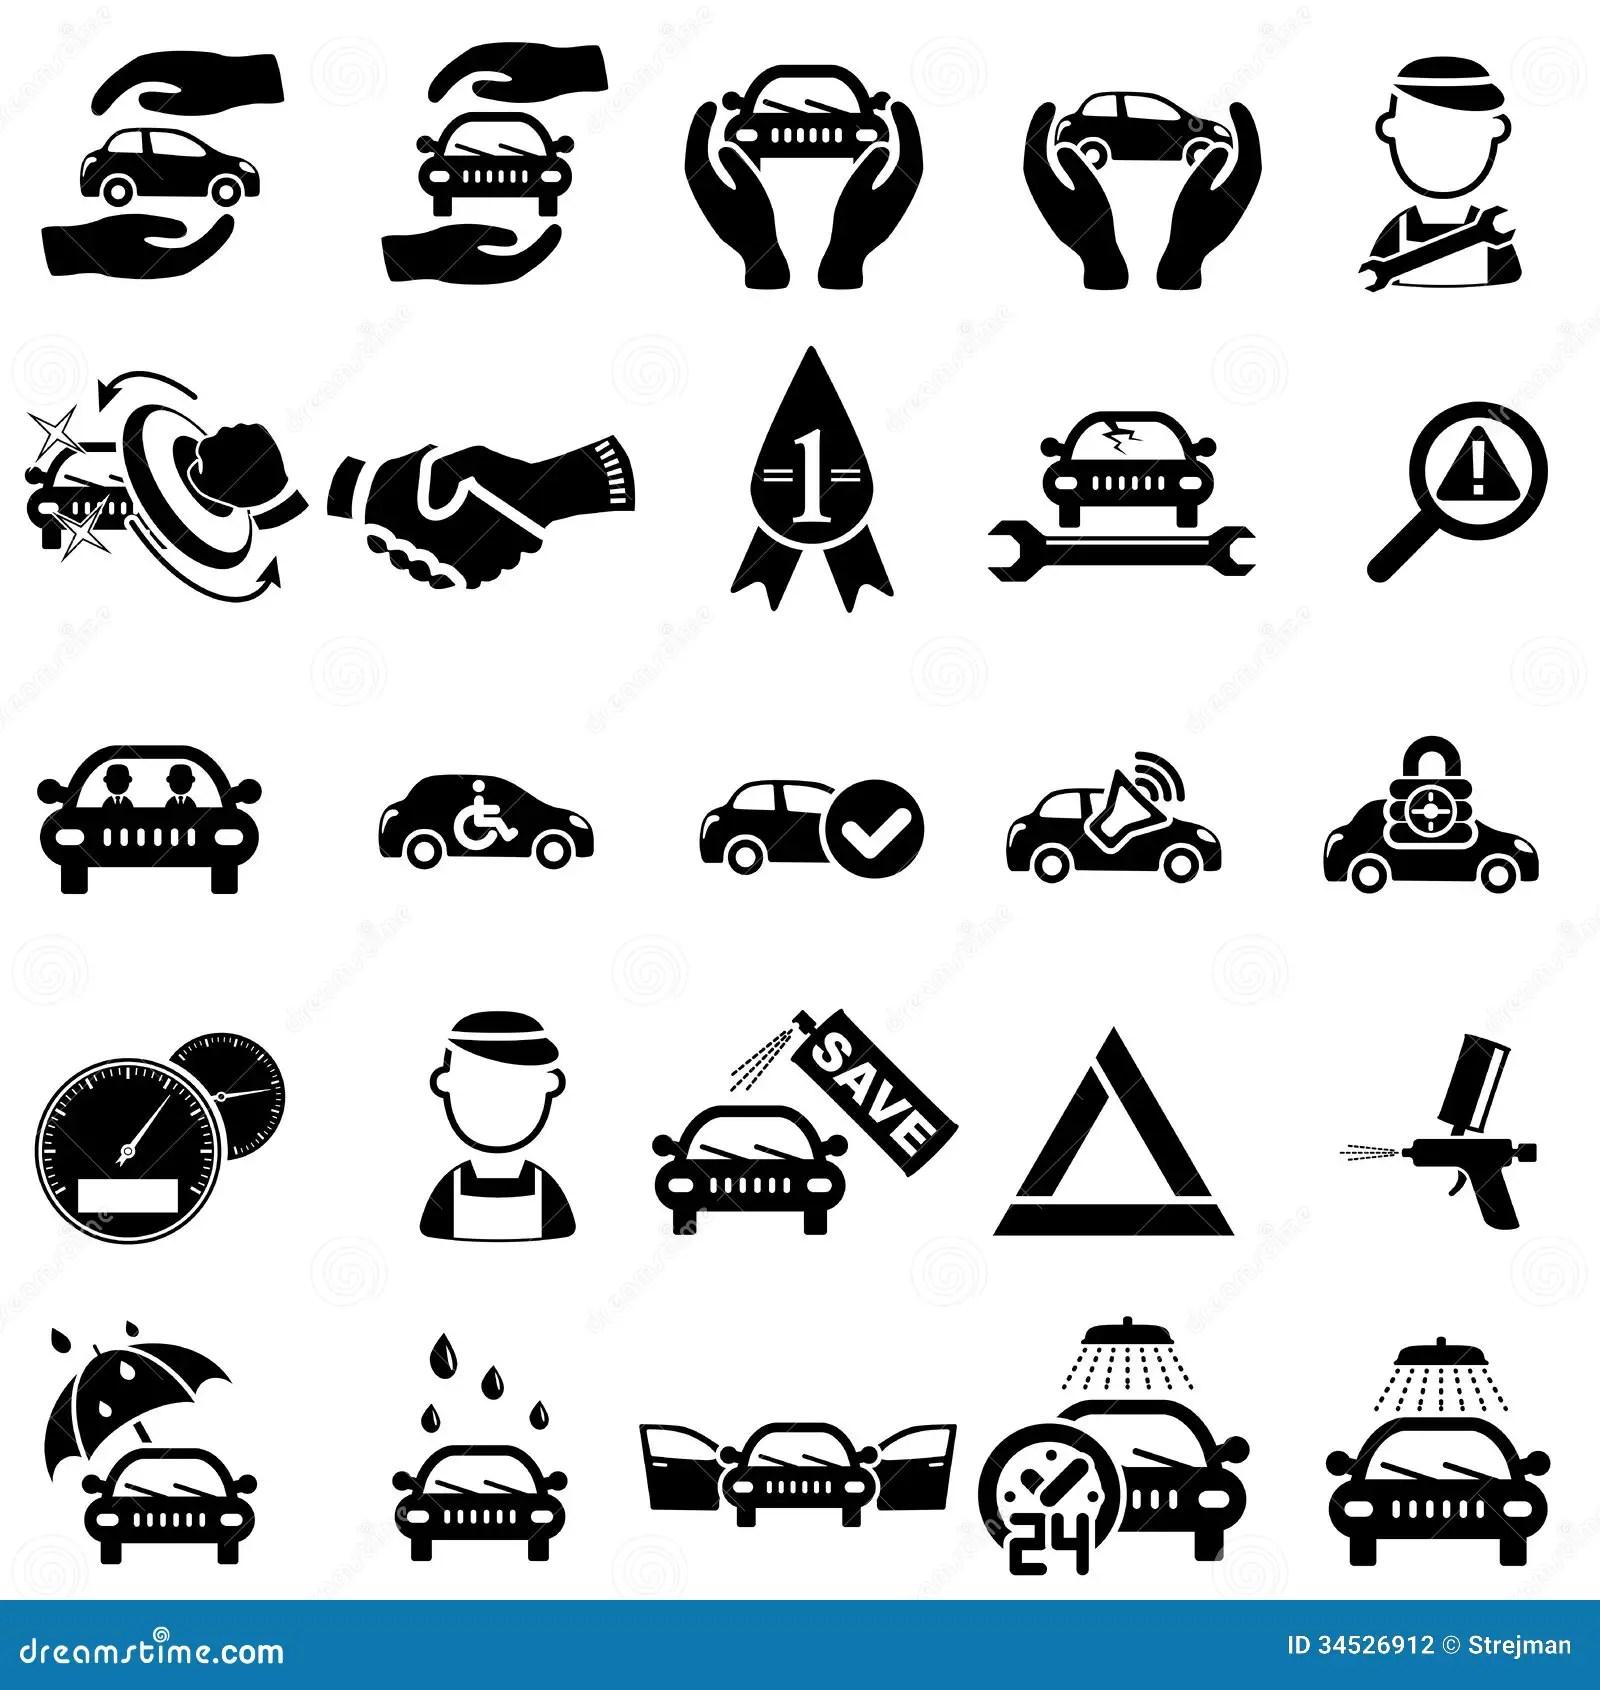 Auto repair Icons stock vector. Illustration of auto